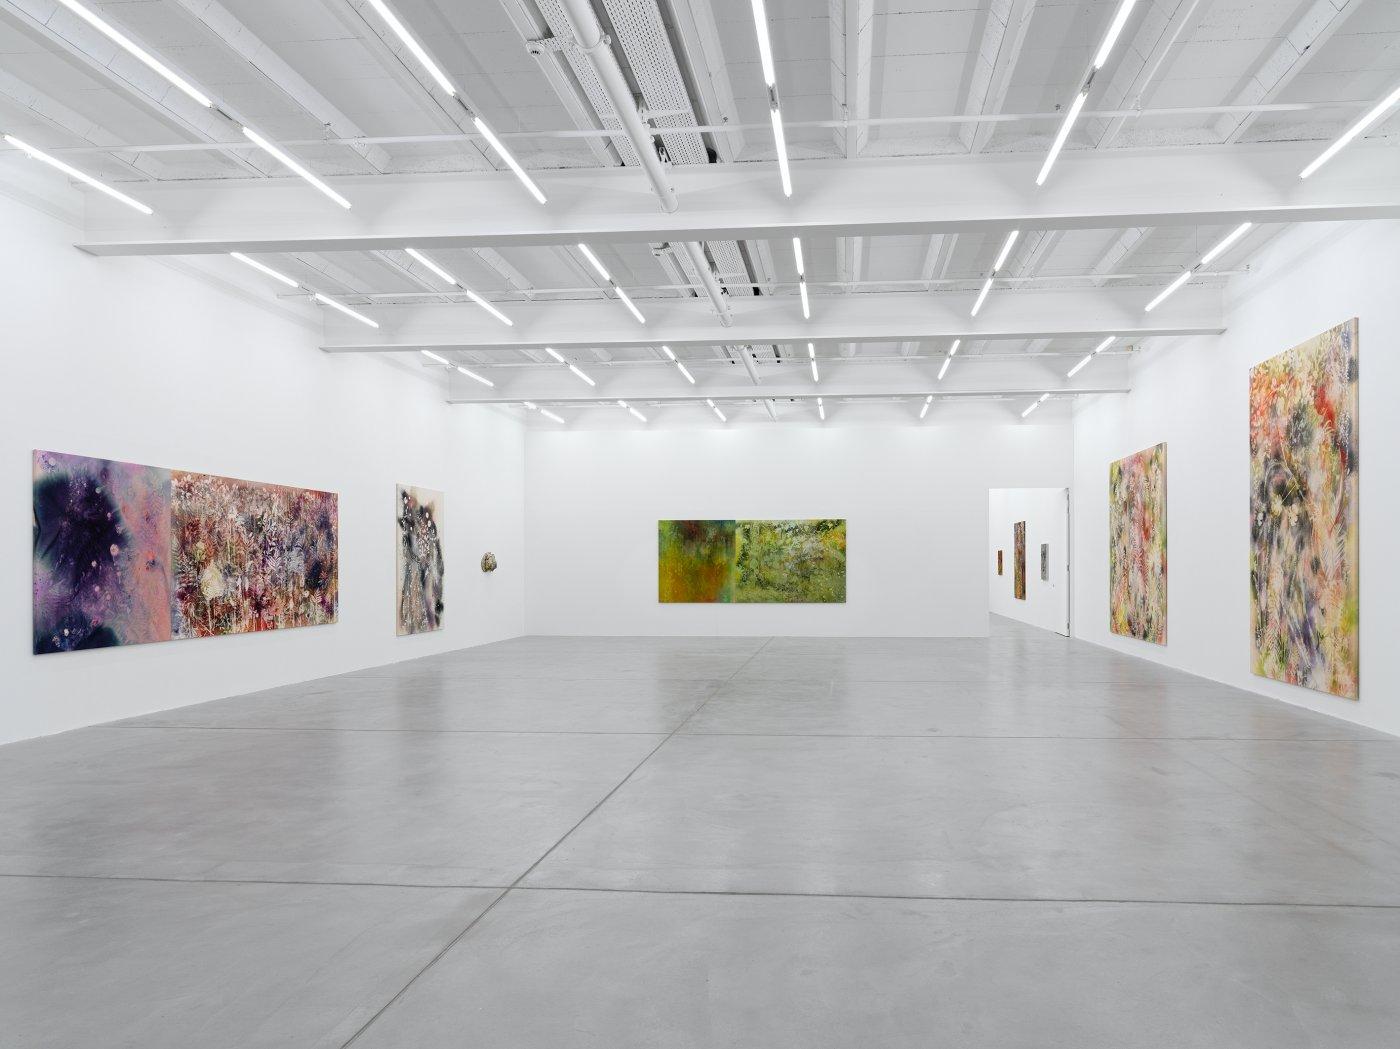 Galerie Eva Presenhuber Maag Areal Sam Falls 4